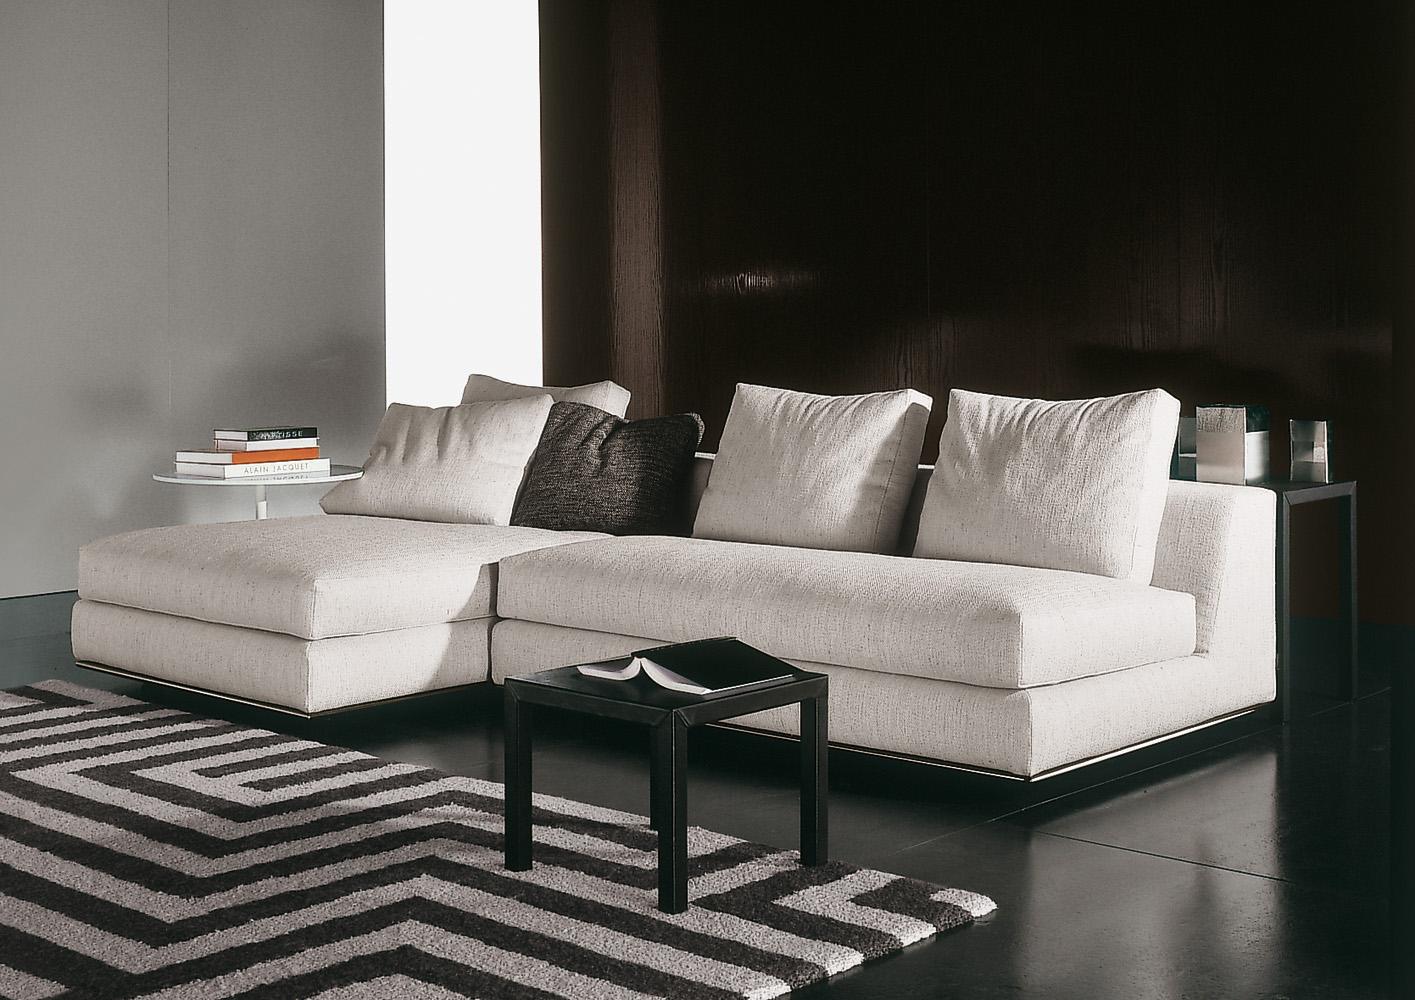 Hamilton Modulo Designed By Rodolfo Dordoni Minotti Orange Skin 03 Minotti  Sectional Sofa